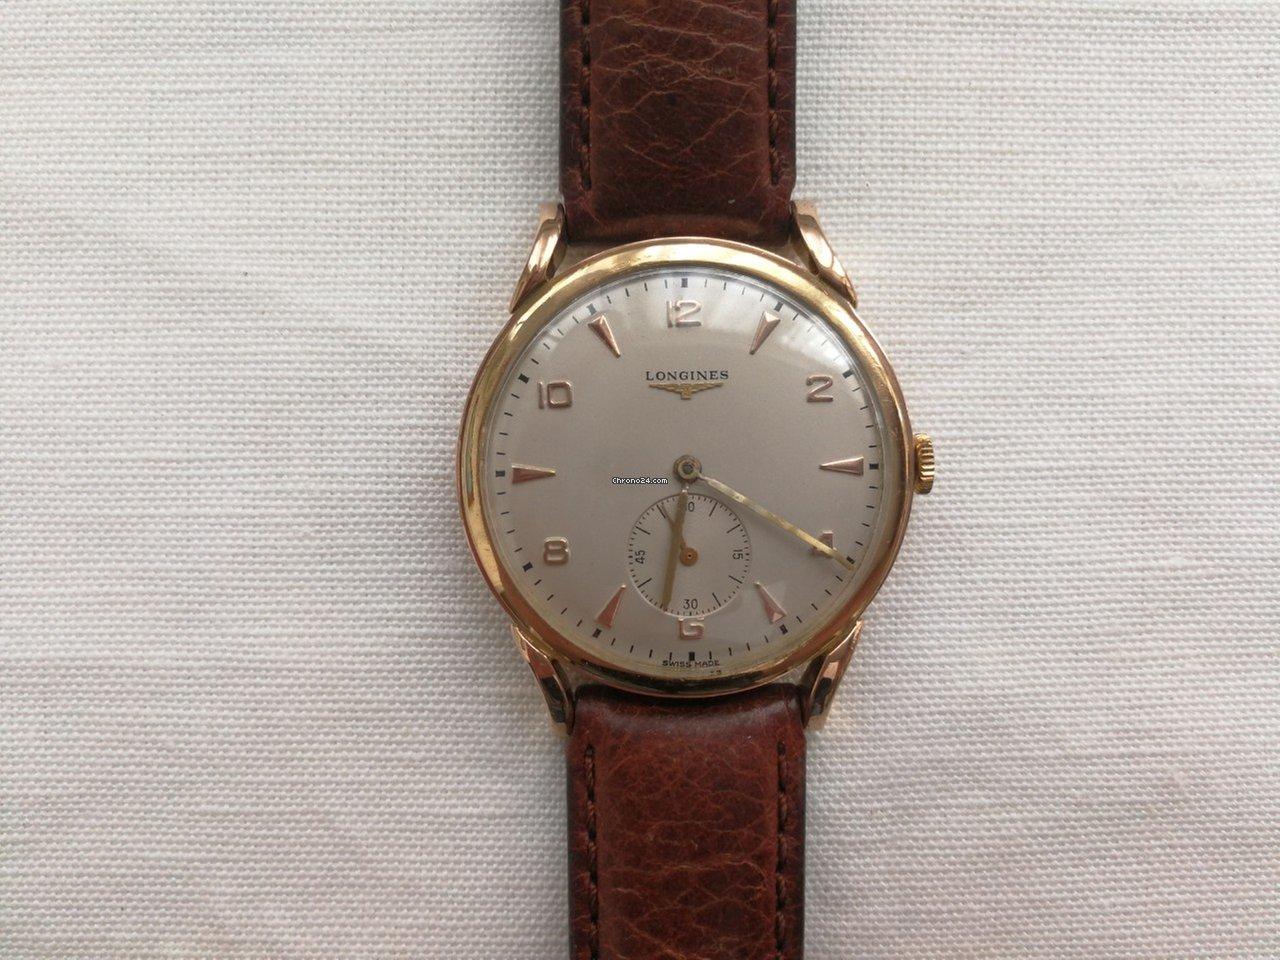 fe2e8f27231 Comprar relógios vintage baratos na Chrono24